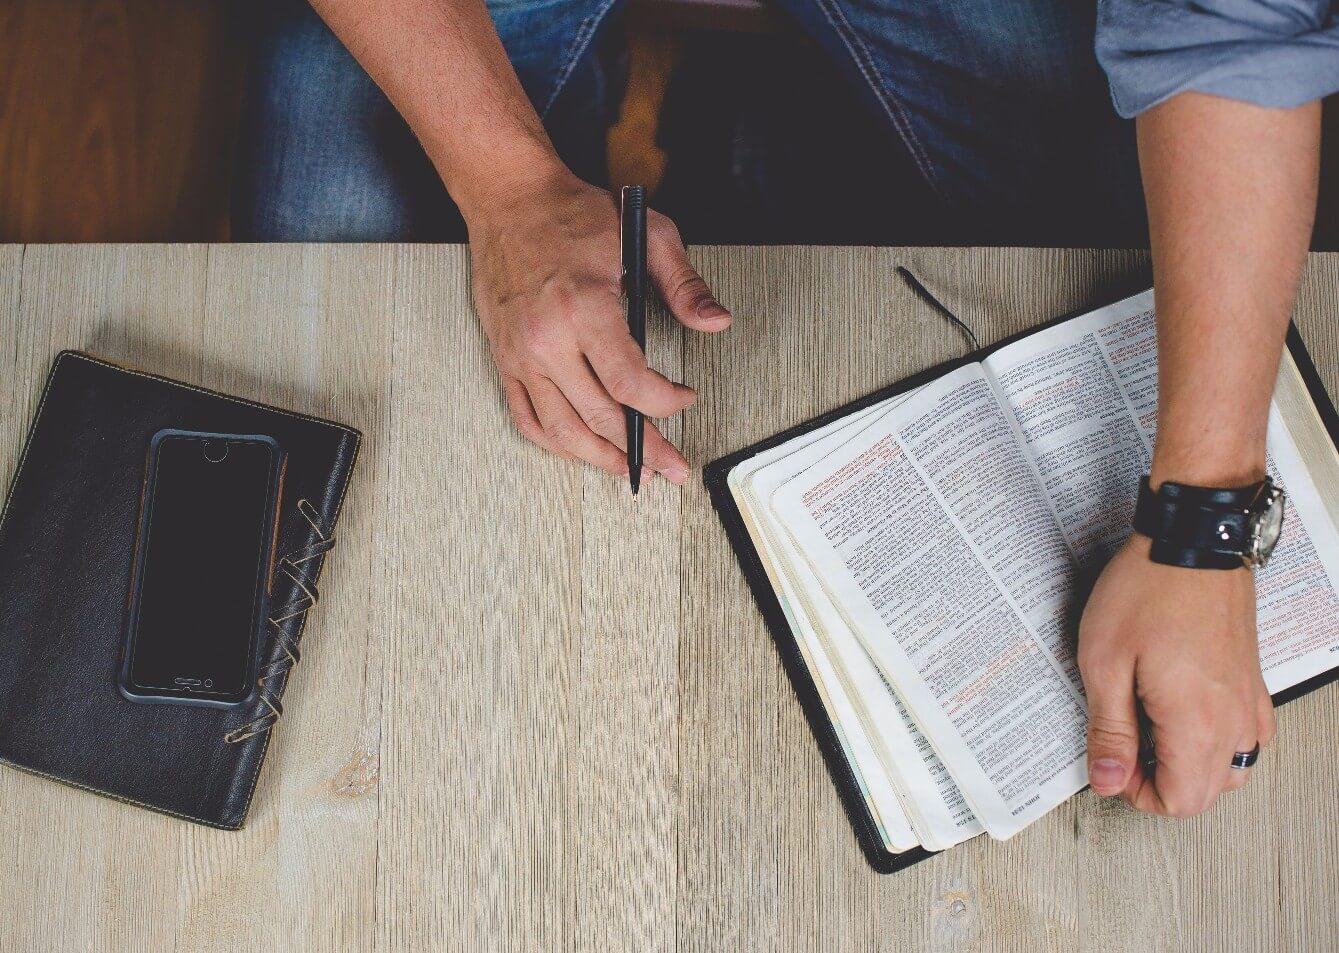 Building Discipleship Focused Relationships on Social Media